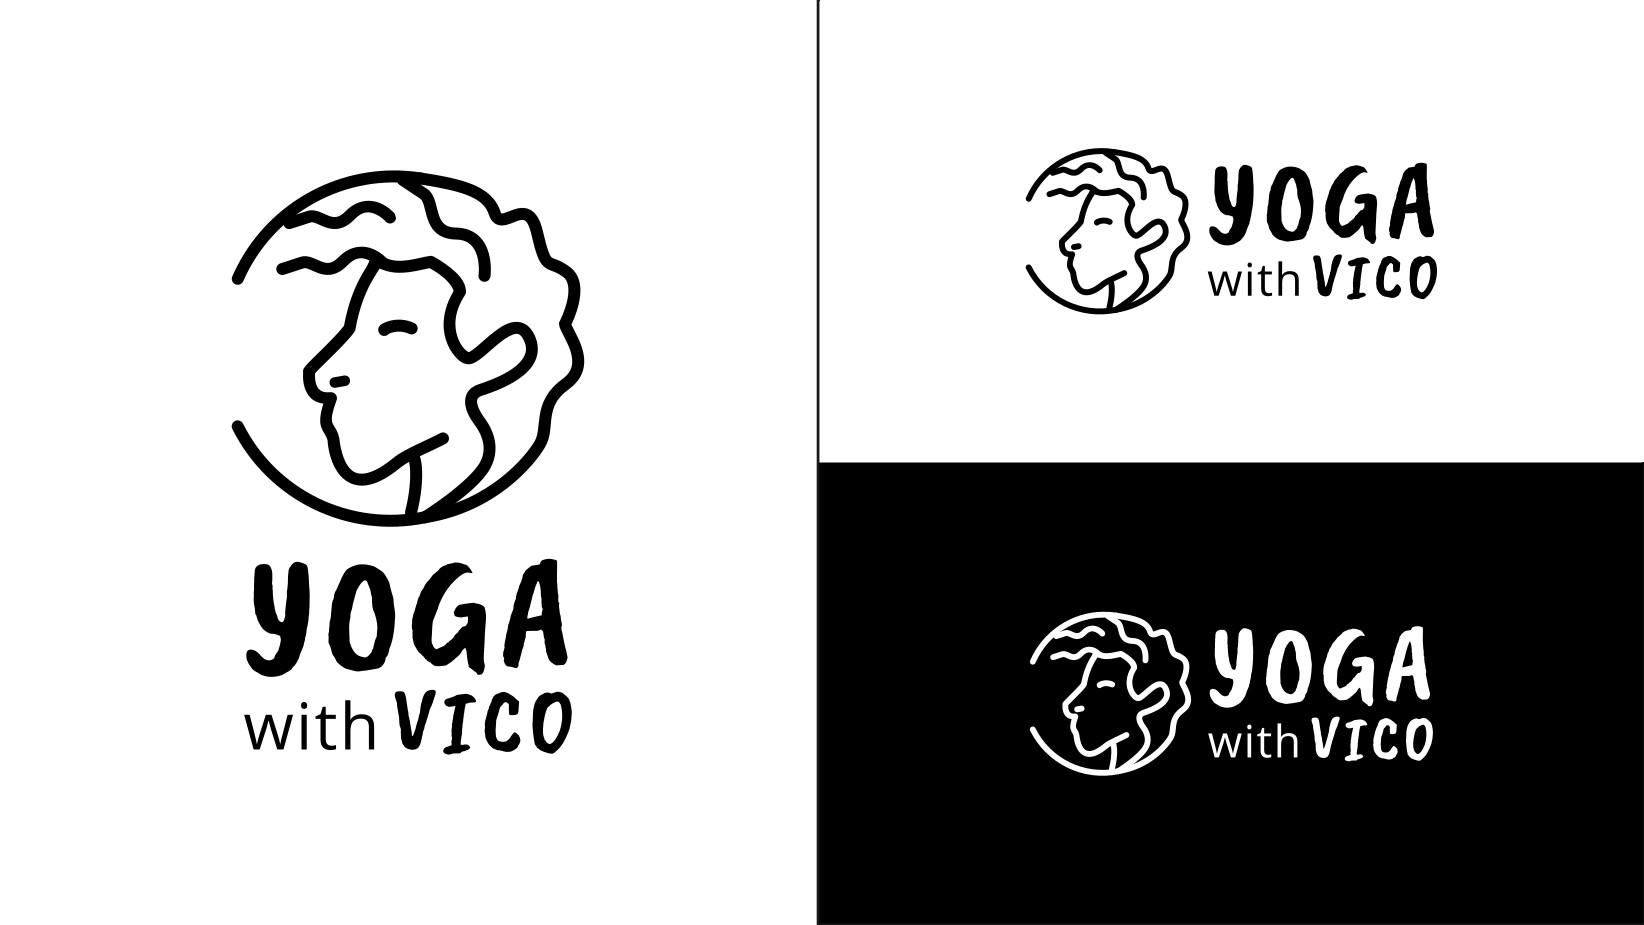 Yoga with Vico alternative logo on black and white background